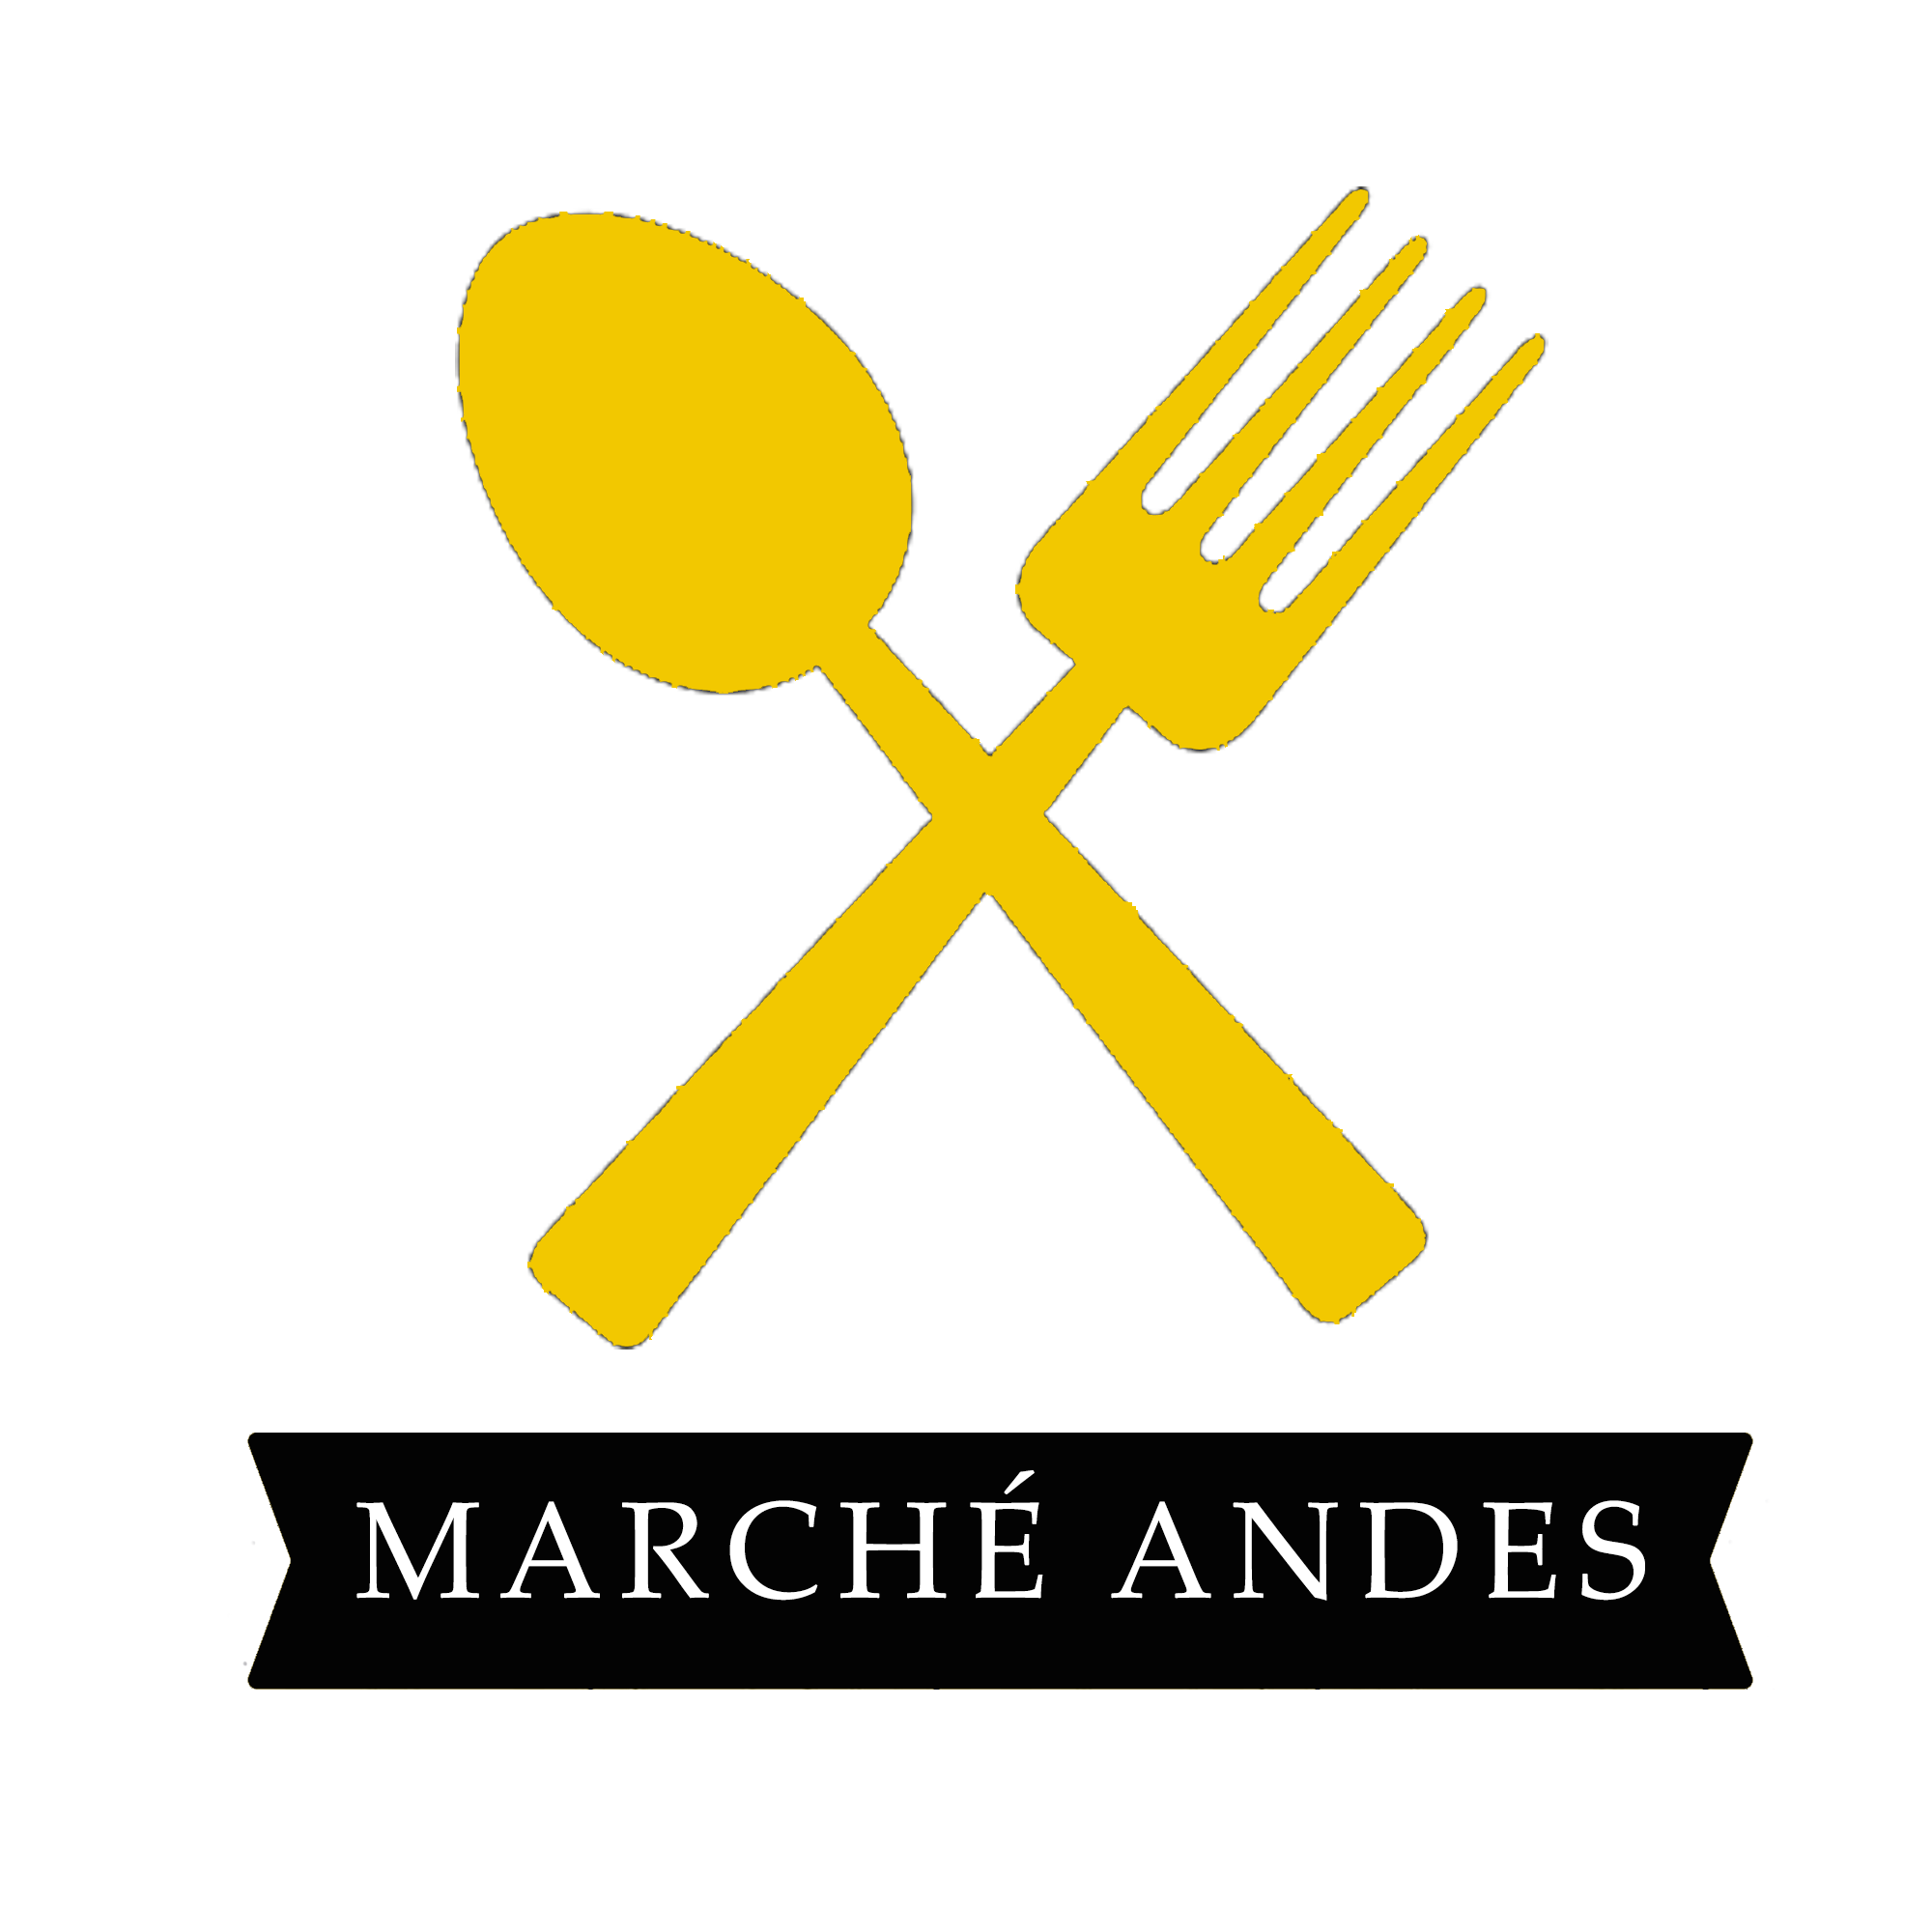 Restaurante Marche Andes